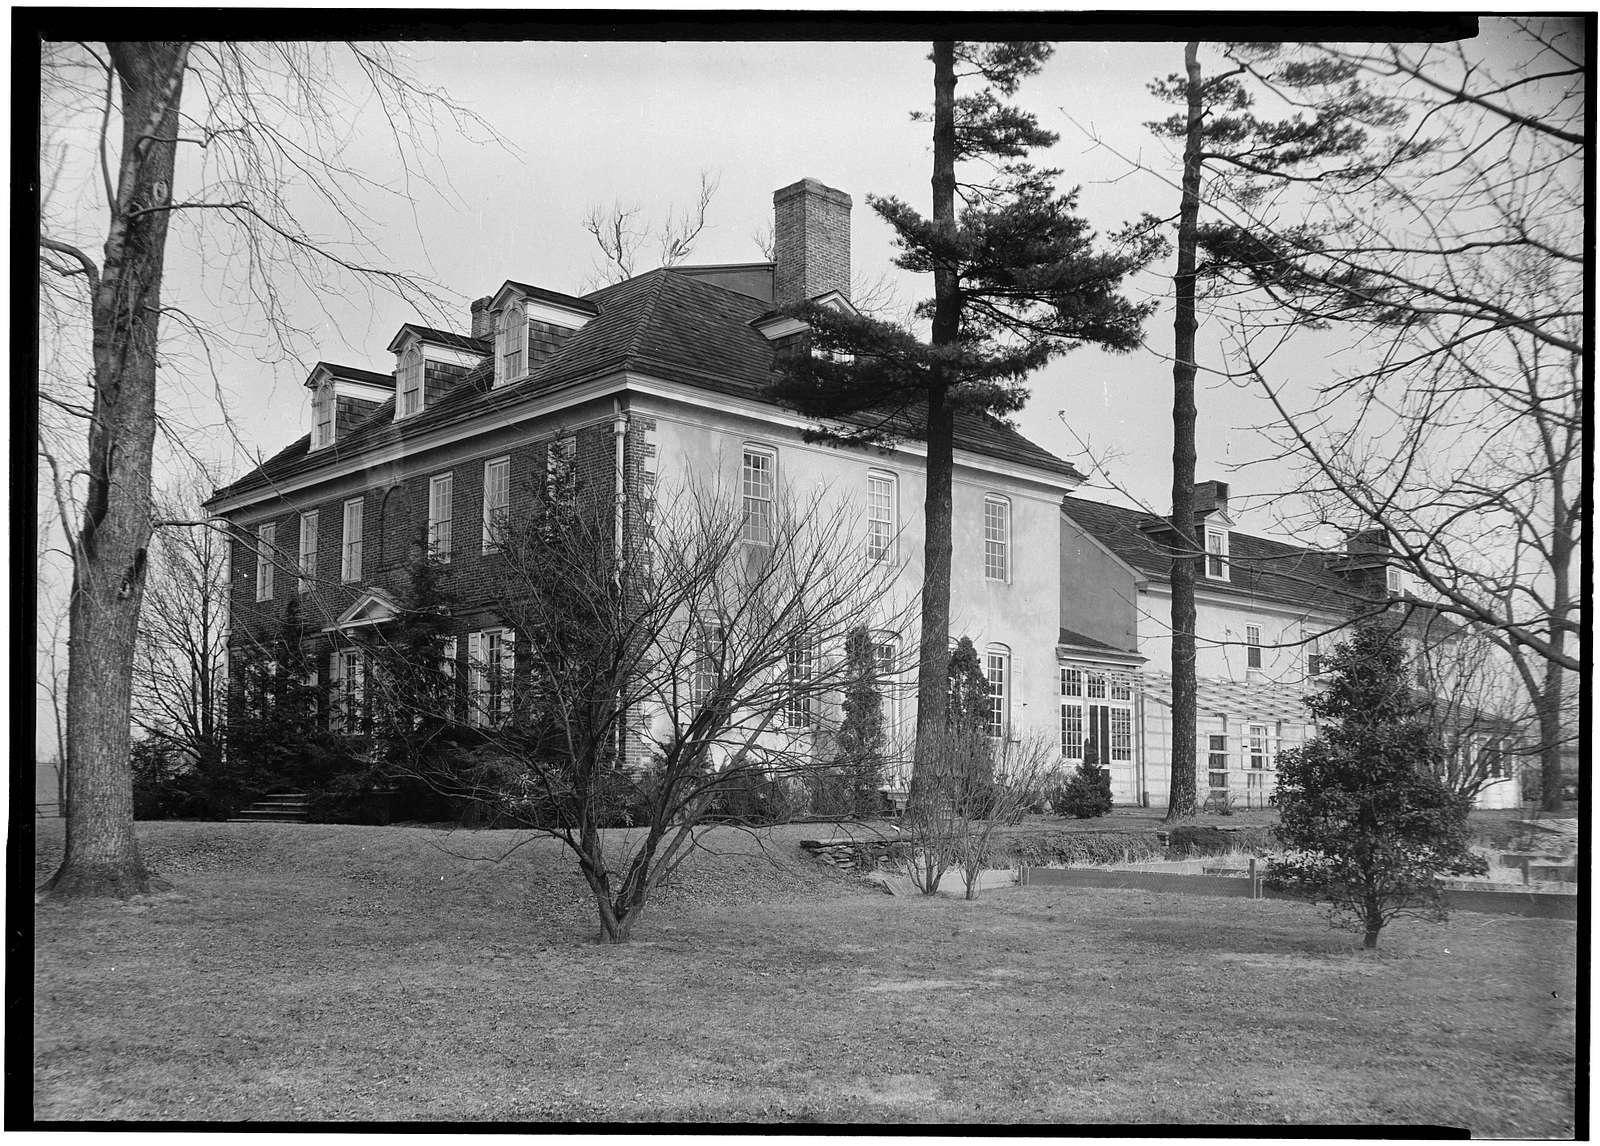 Hope Lodge, Bethlehem & Skippack Pikes, Whitemarsh, Montgomery County, PA